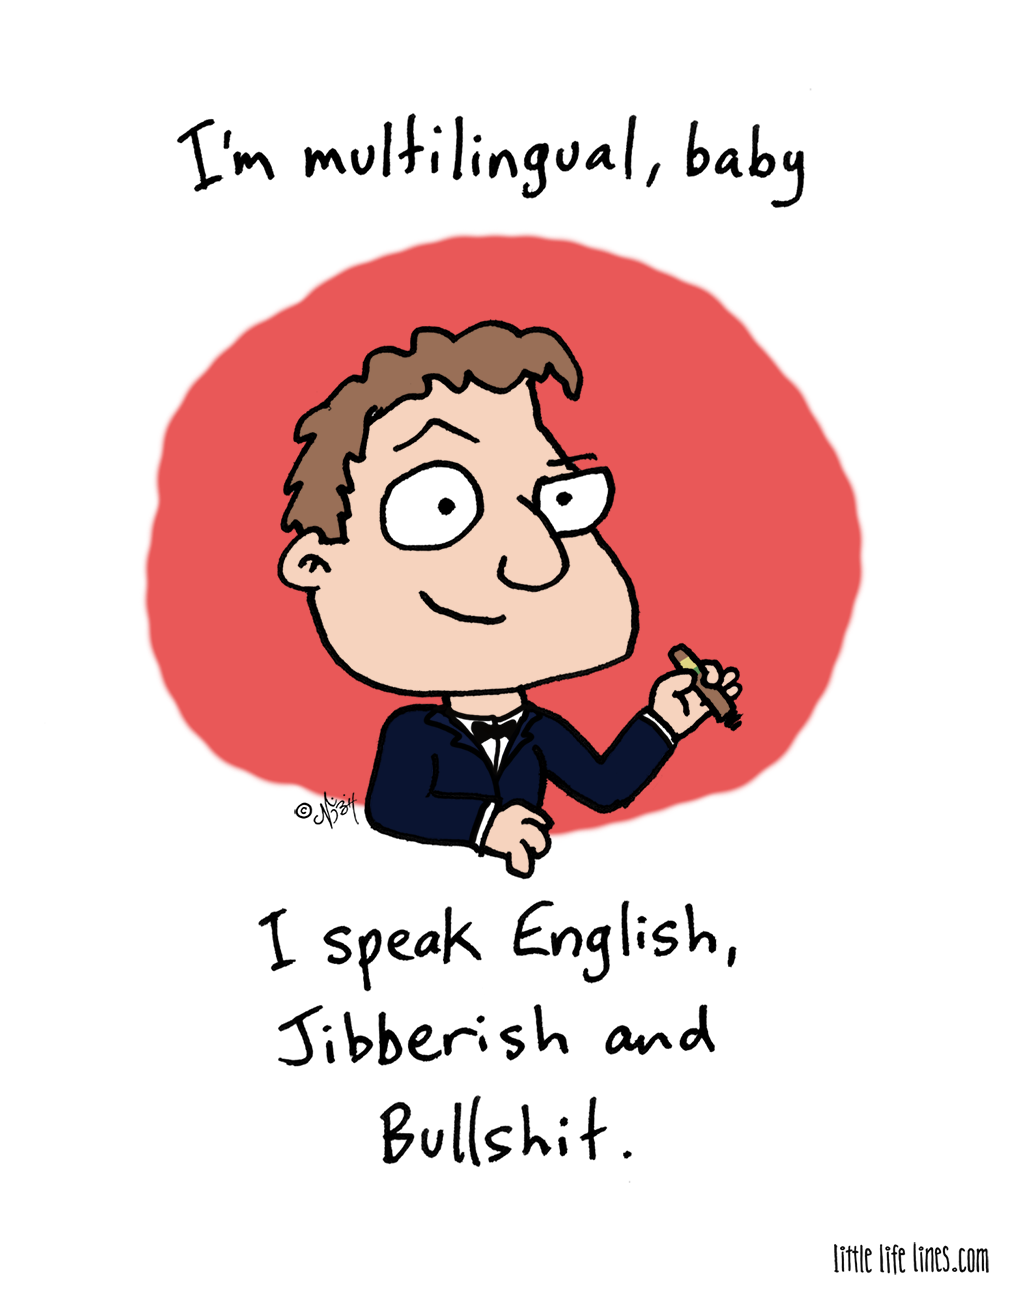 Multilingual cartoon man speaks several languages